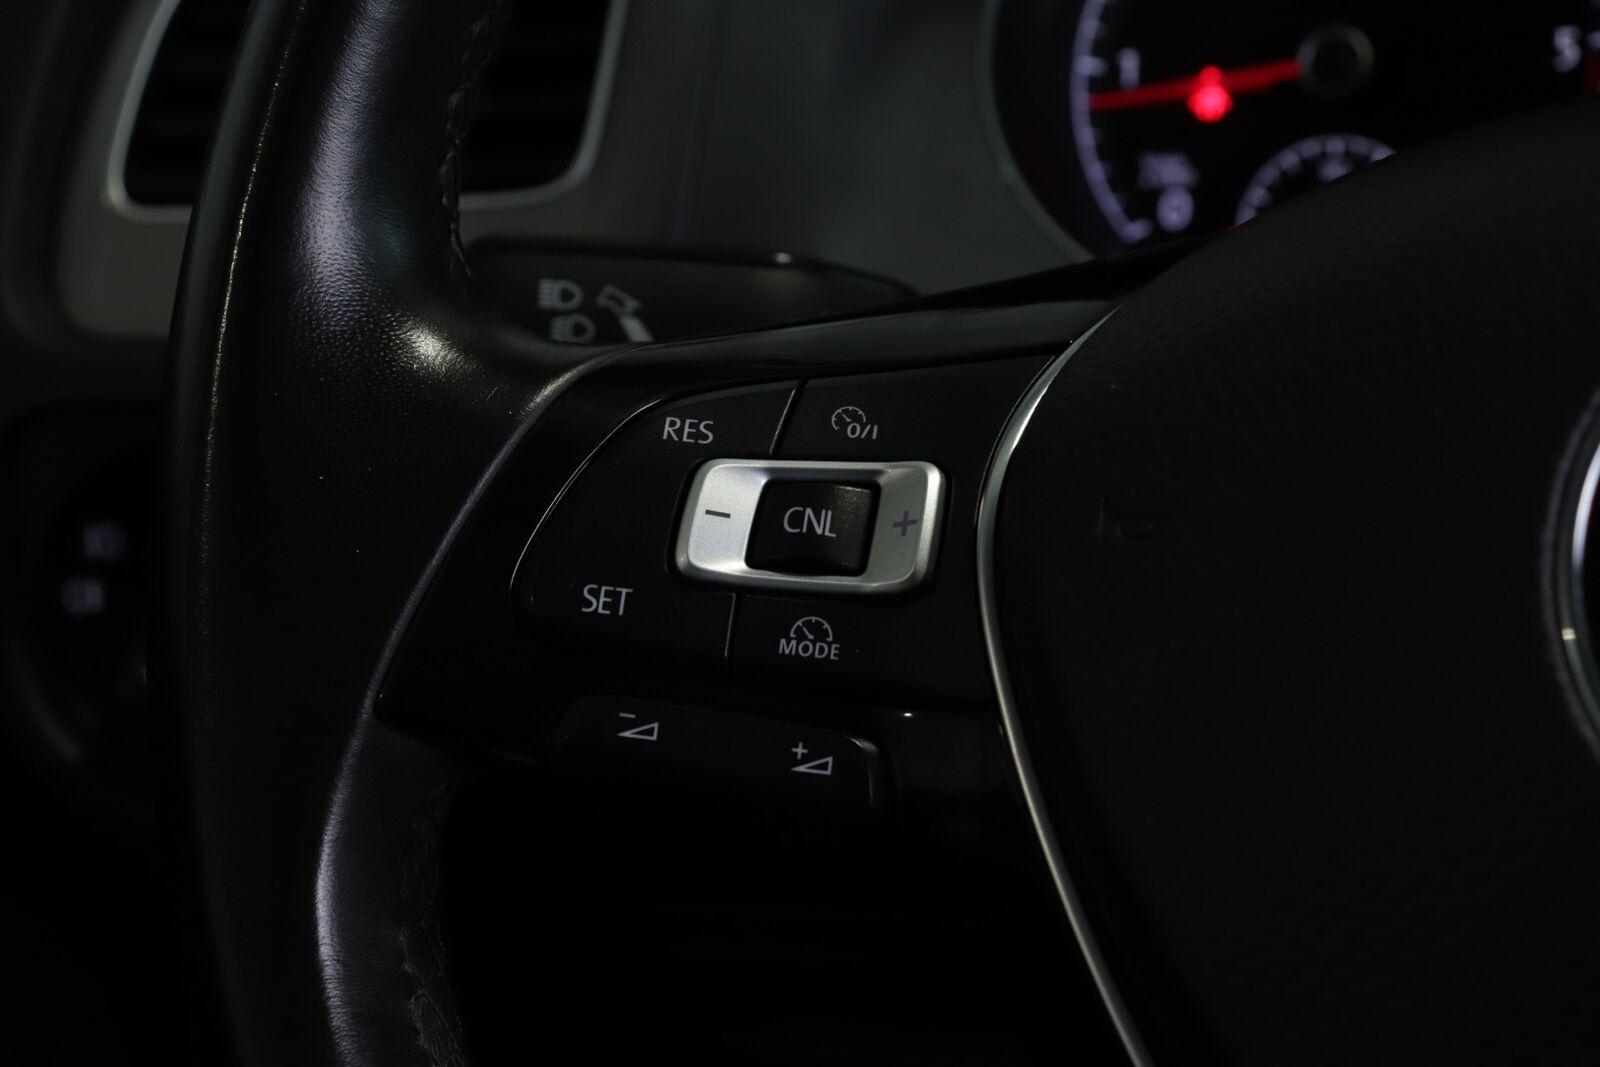 VW Golf VII TDi 110 Trendline Variant BMT